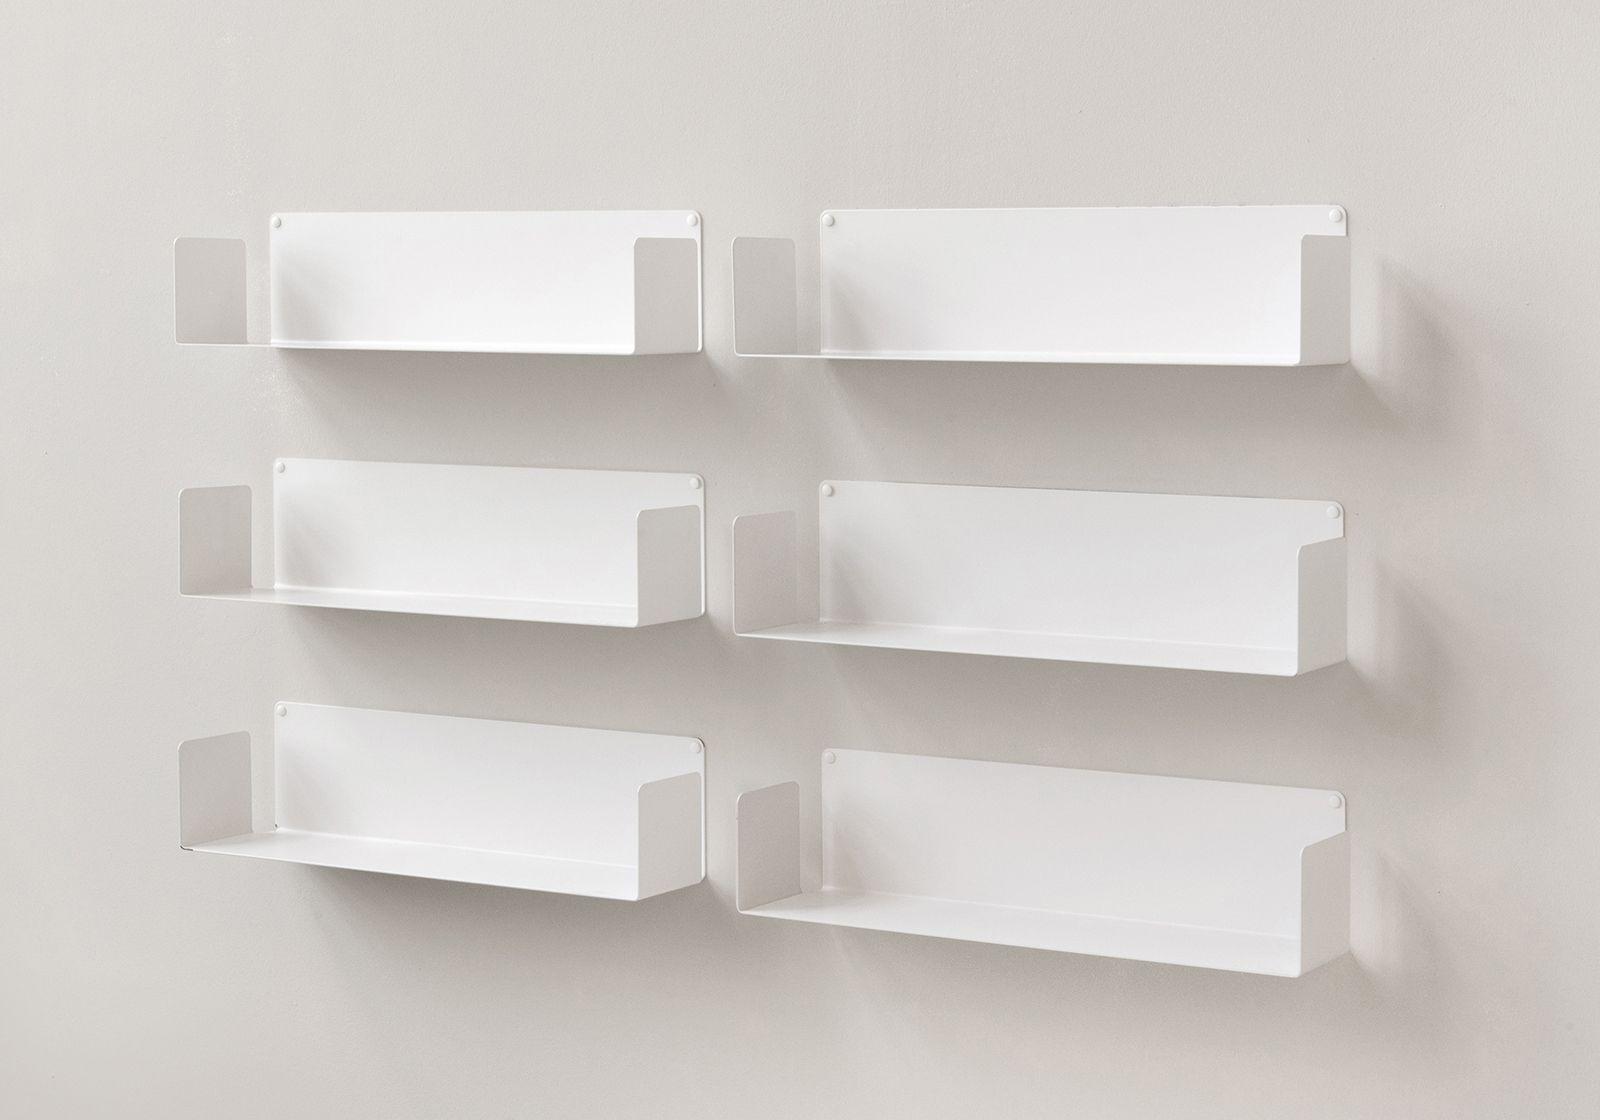 vente tag re range cd lot de 6 60 cm acier. Black Bedroom Furniture Sets. Home Design Ideas